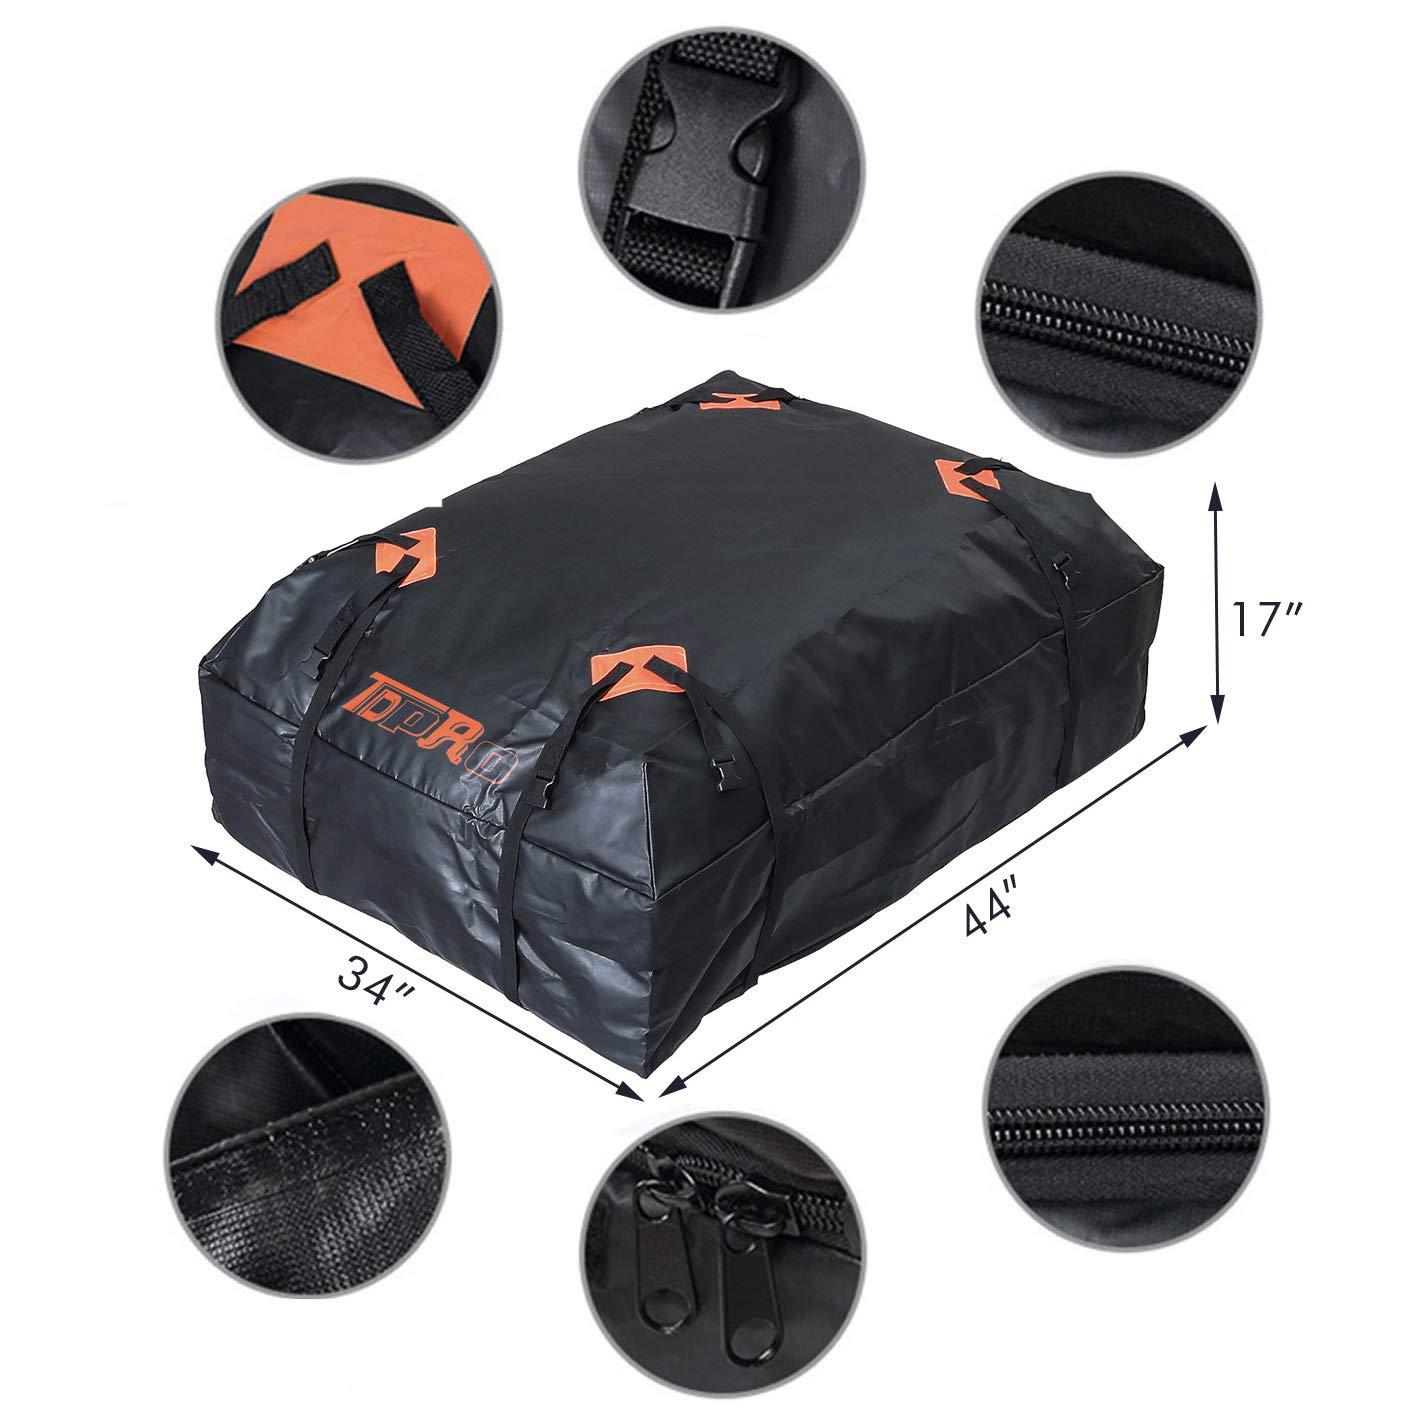 Waterproof Snowproof Rainproof Car Cargo Bag Soft-Shell Carriers 15 Cubic Feet Capacity Luggag Rack Bag Acouto Car Roof Bag Car Rooftop Cargo Carrier